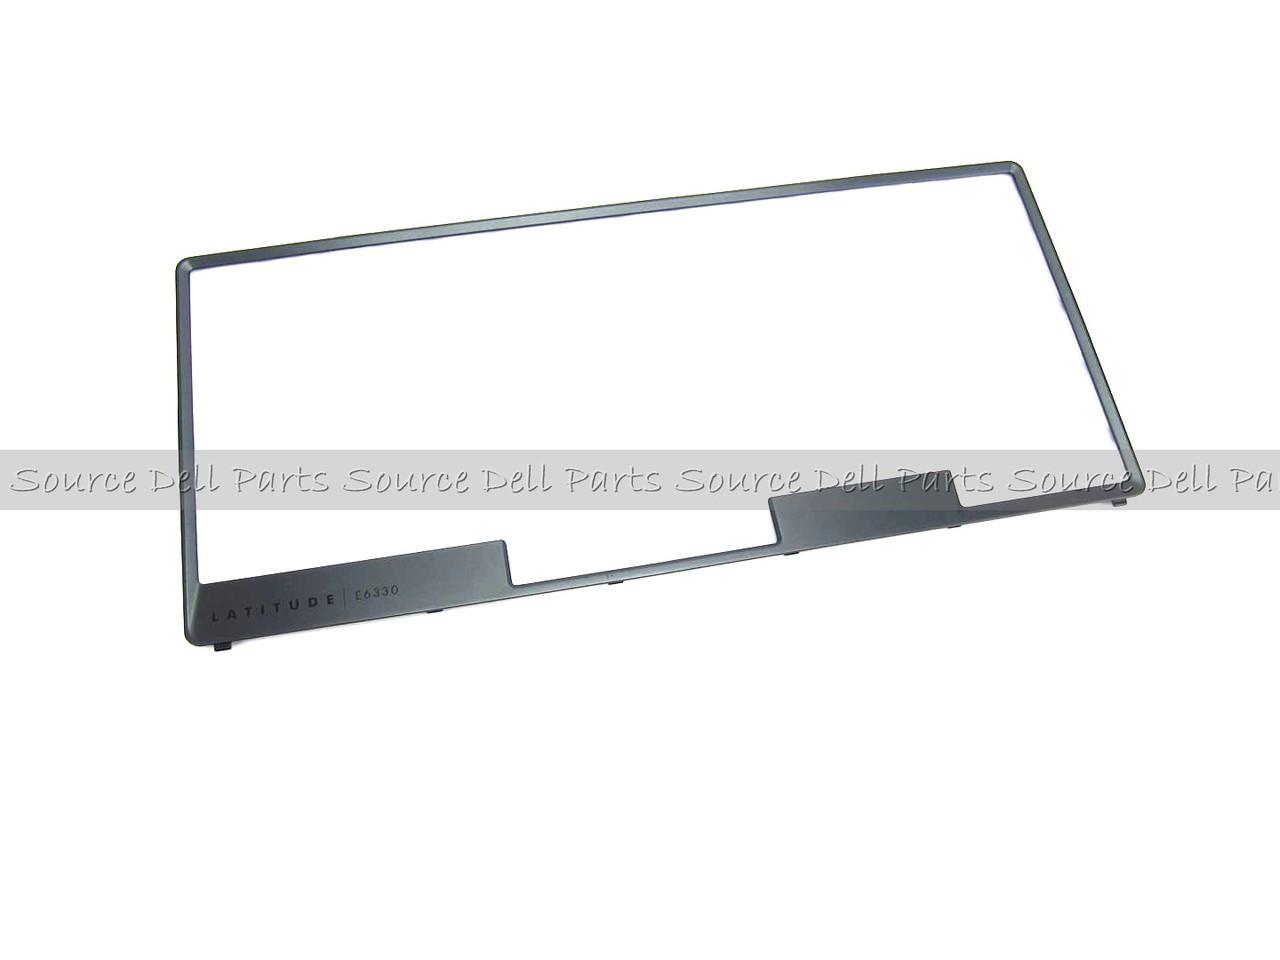 Dell Latitude E6330 Keyboard Bezel Trim Overlay - CC1TT